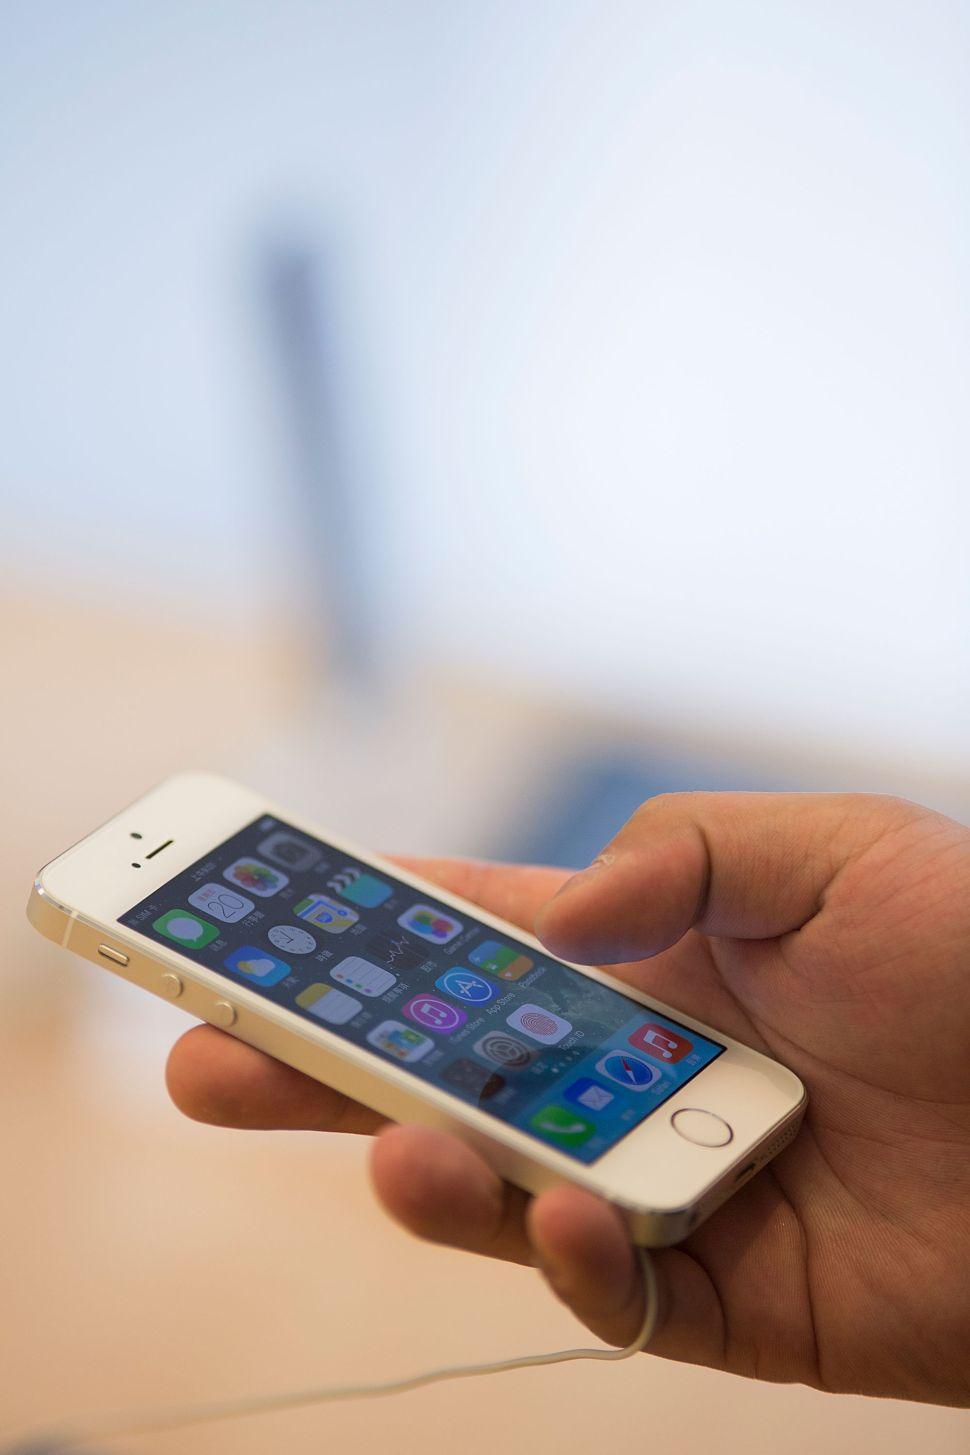 Déjà Vu: Will Apple Release Another Four-Inch iPhone?